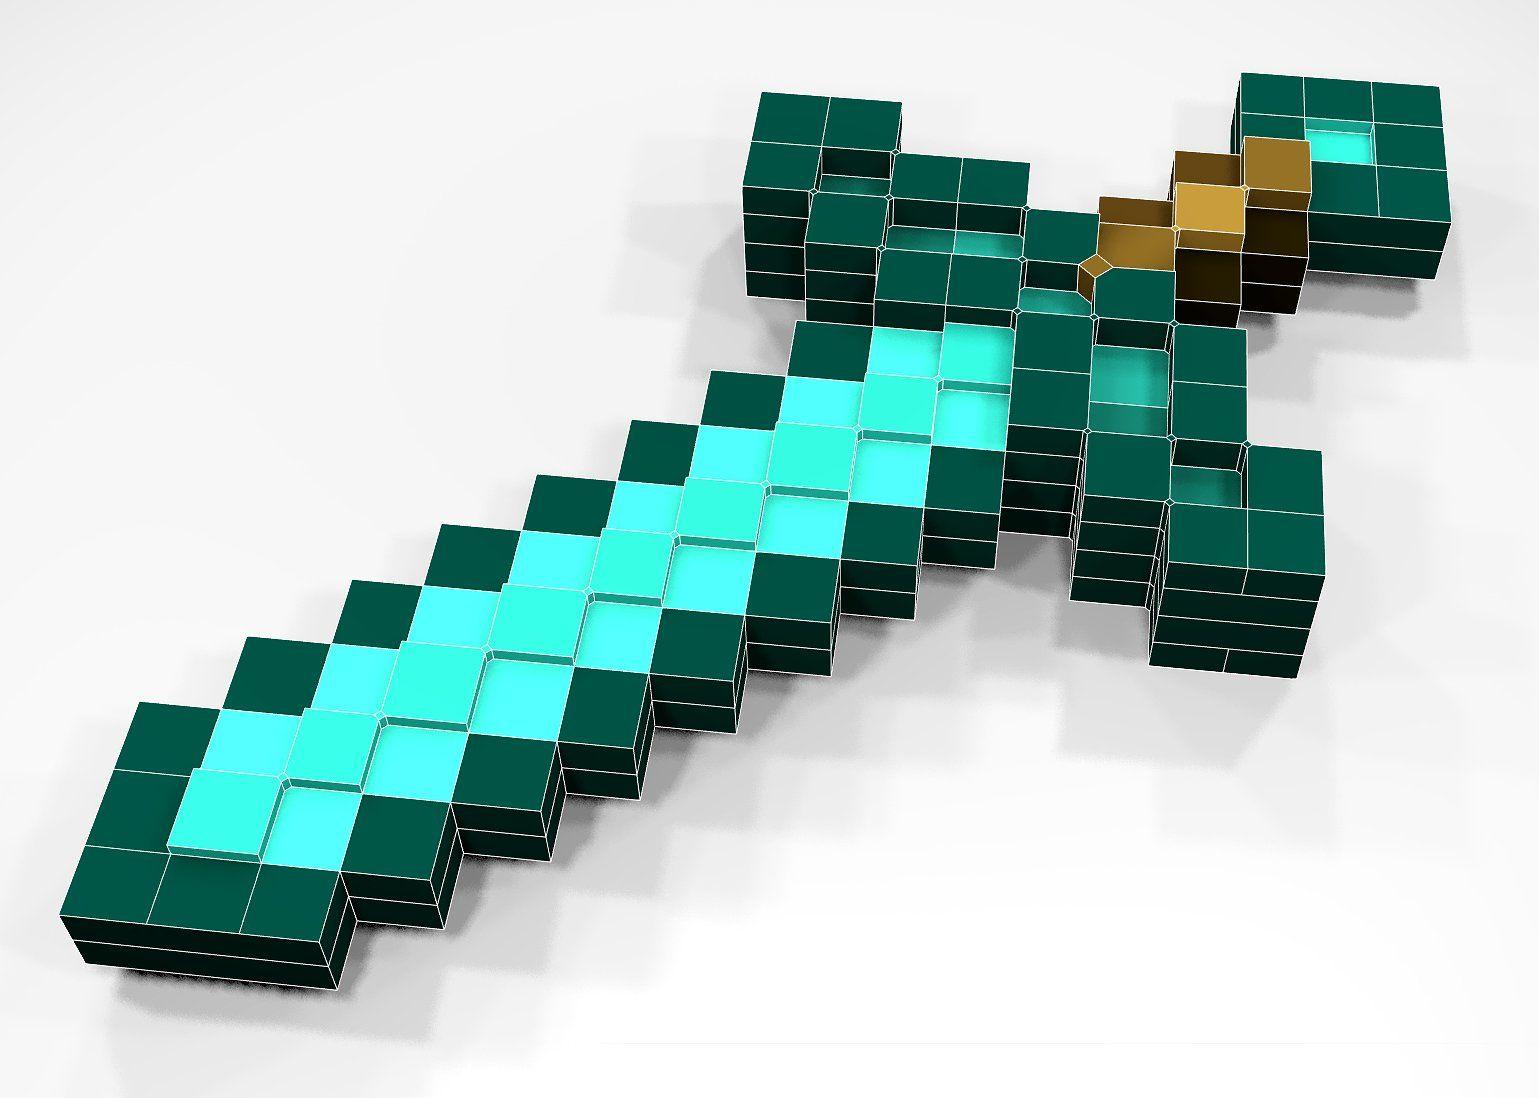 Minecraft Diamond Sword Full 3d Minecraft Diamond Sword Minecraft Sword Minecraft